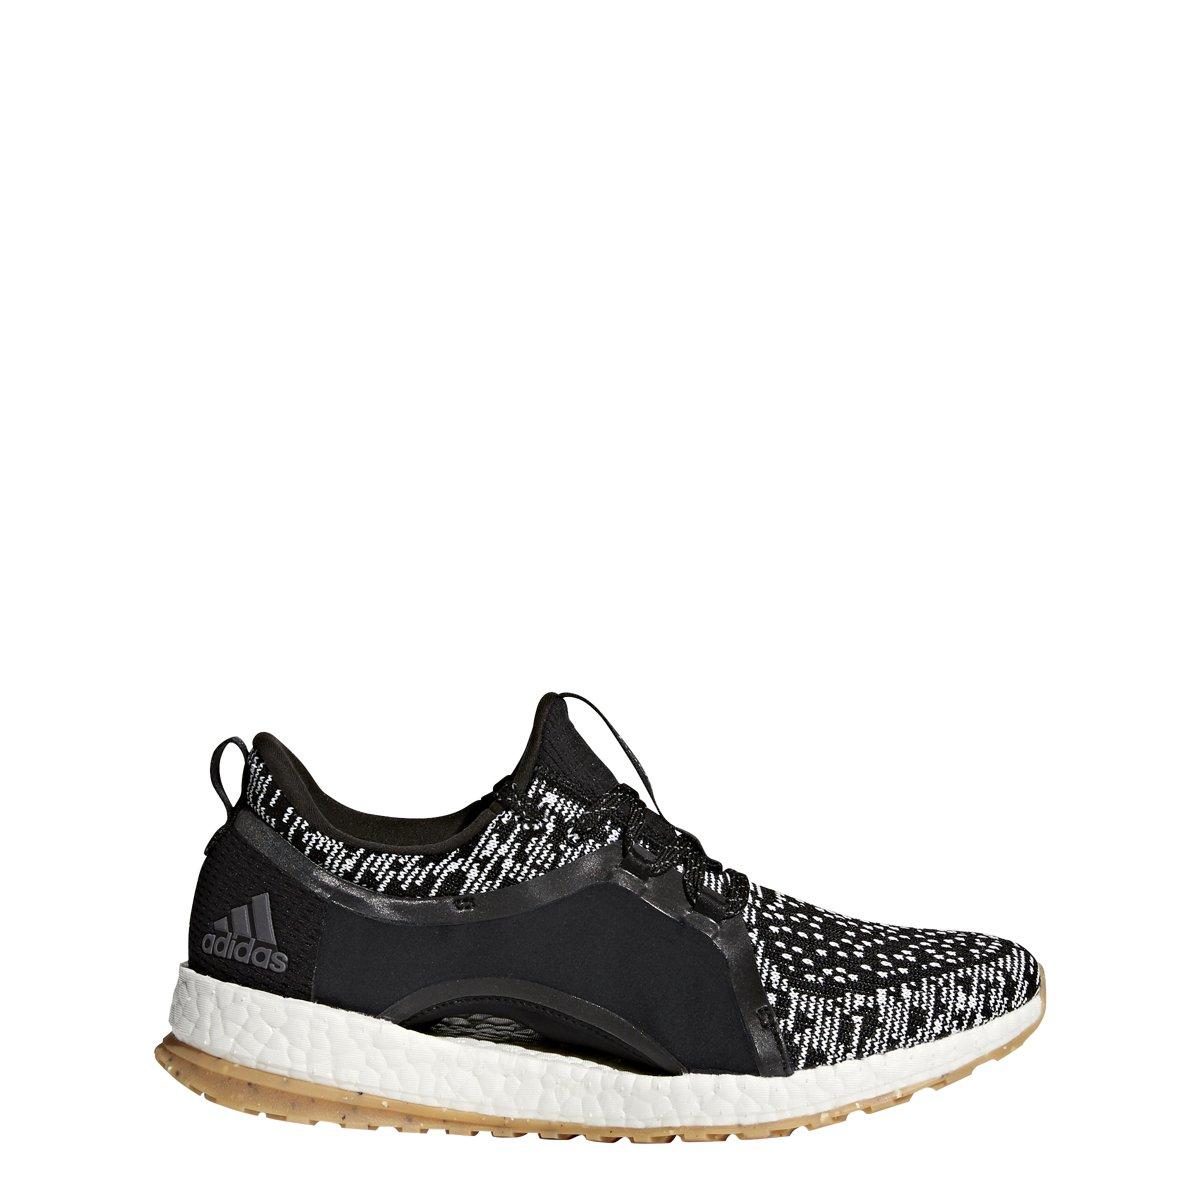 adidas Performance Women's Pureboost X ATR Running Shoe, Black/White/Black, 9 Medium US